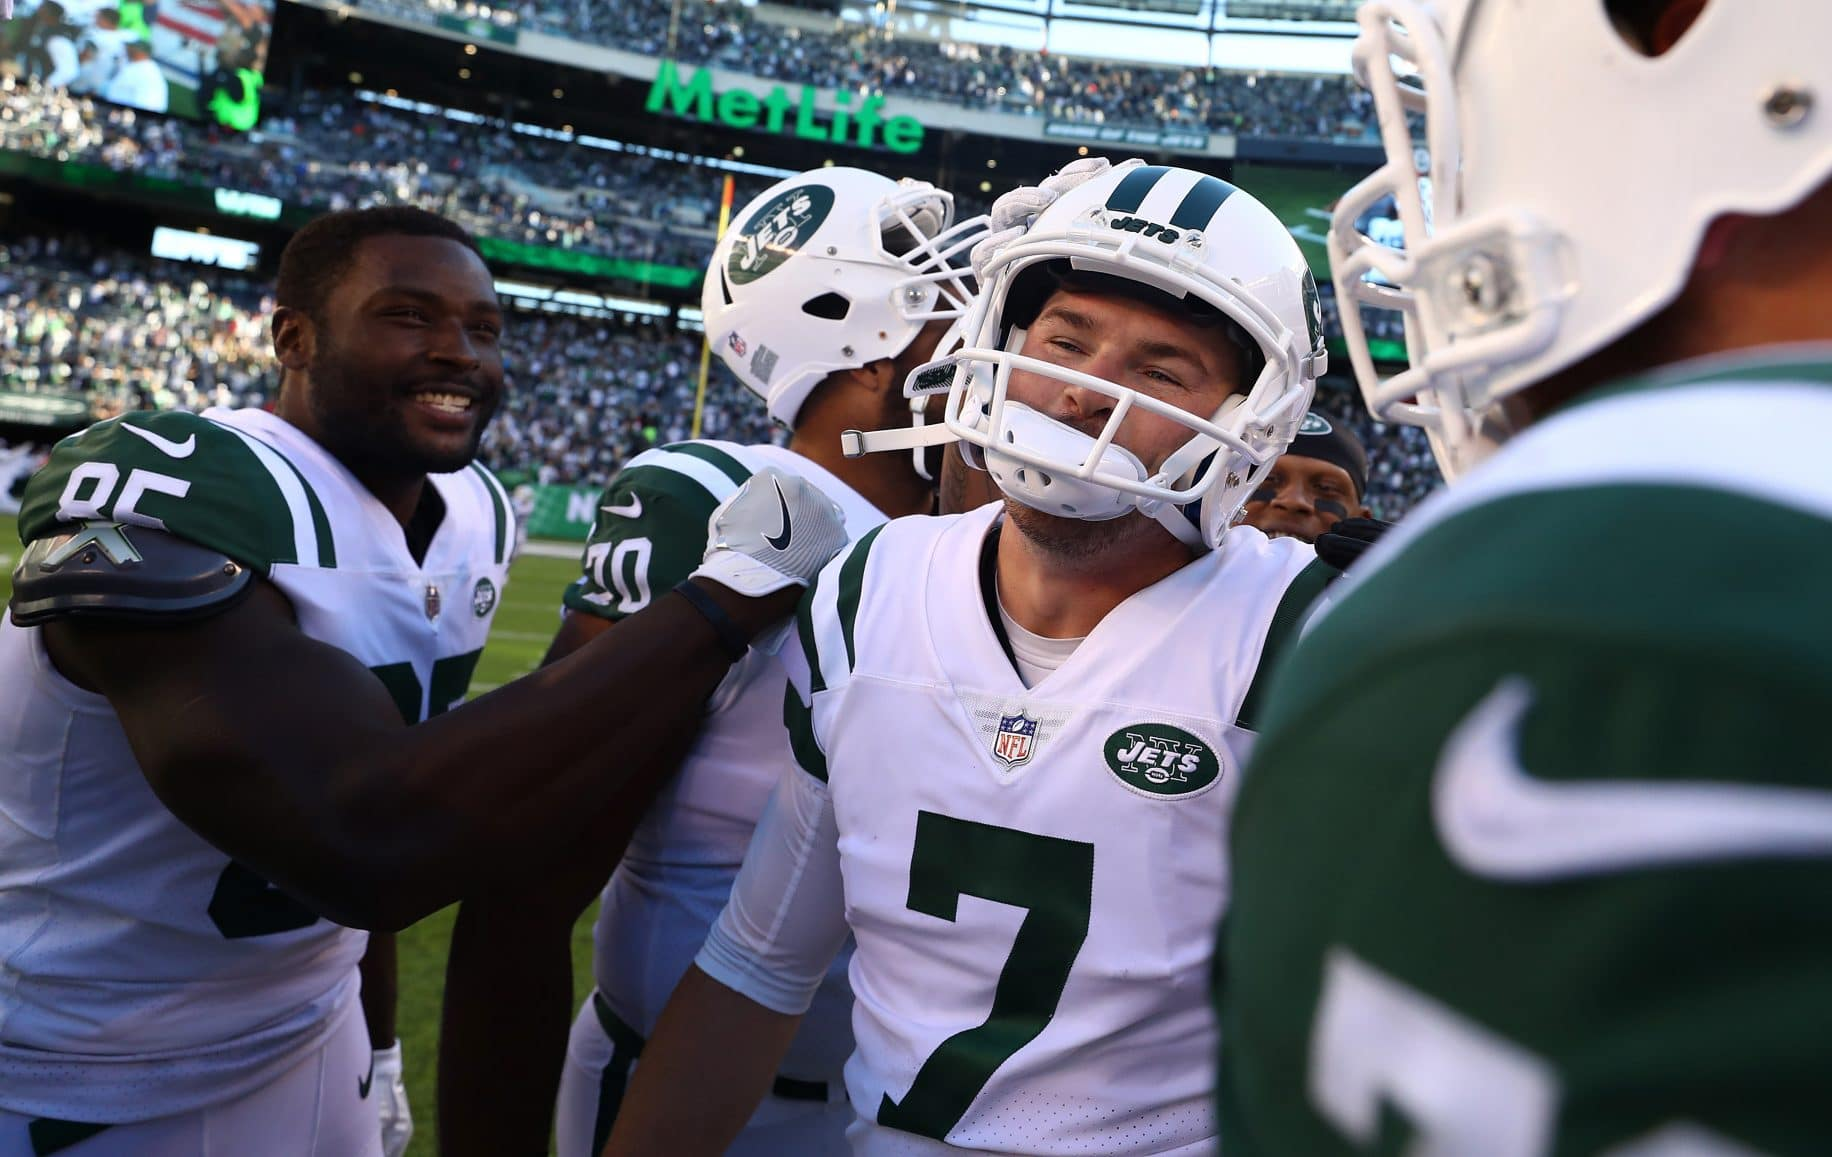 Chandler Catanzaro New York Jets